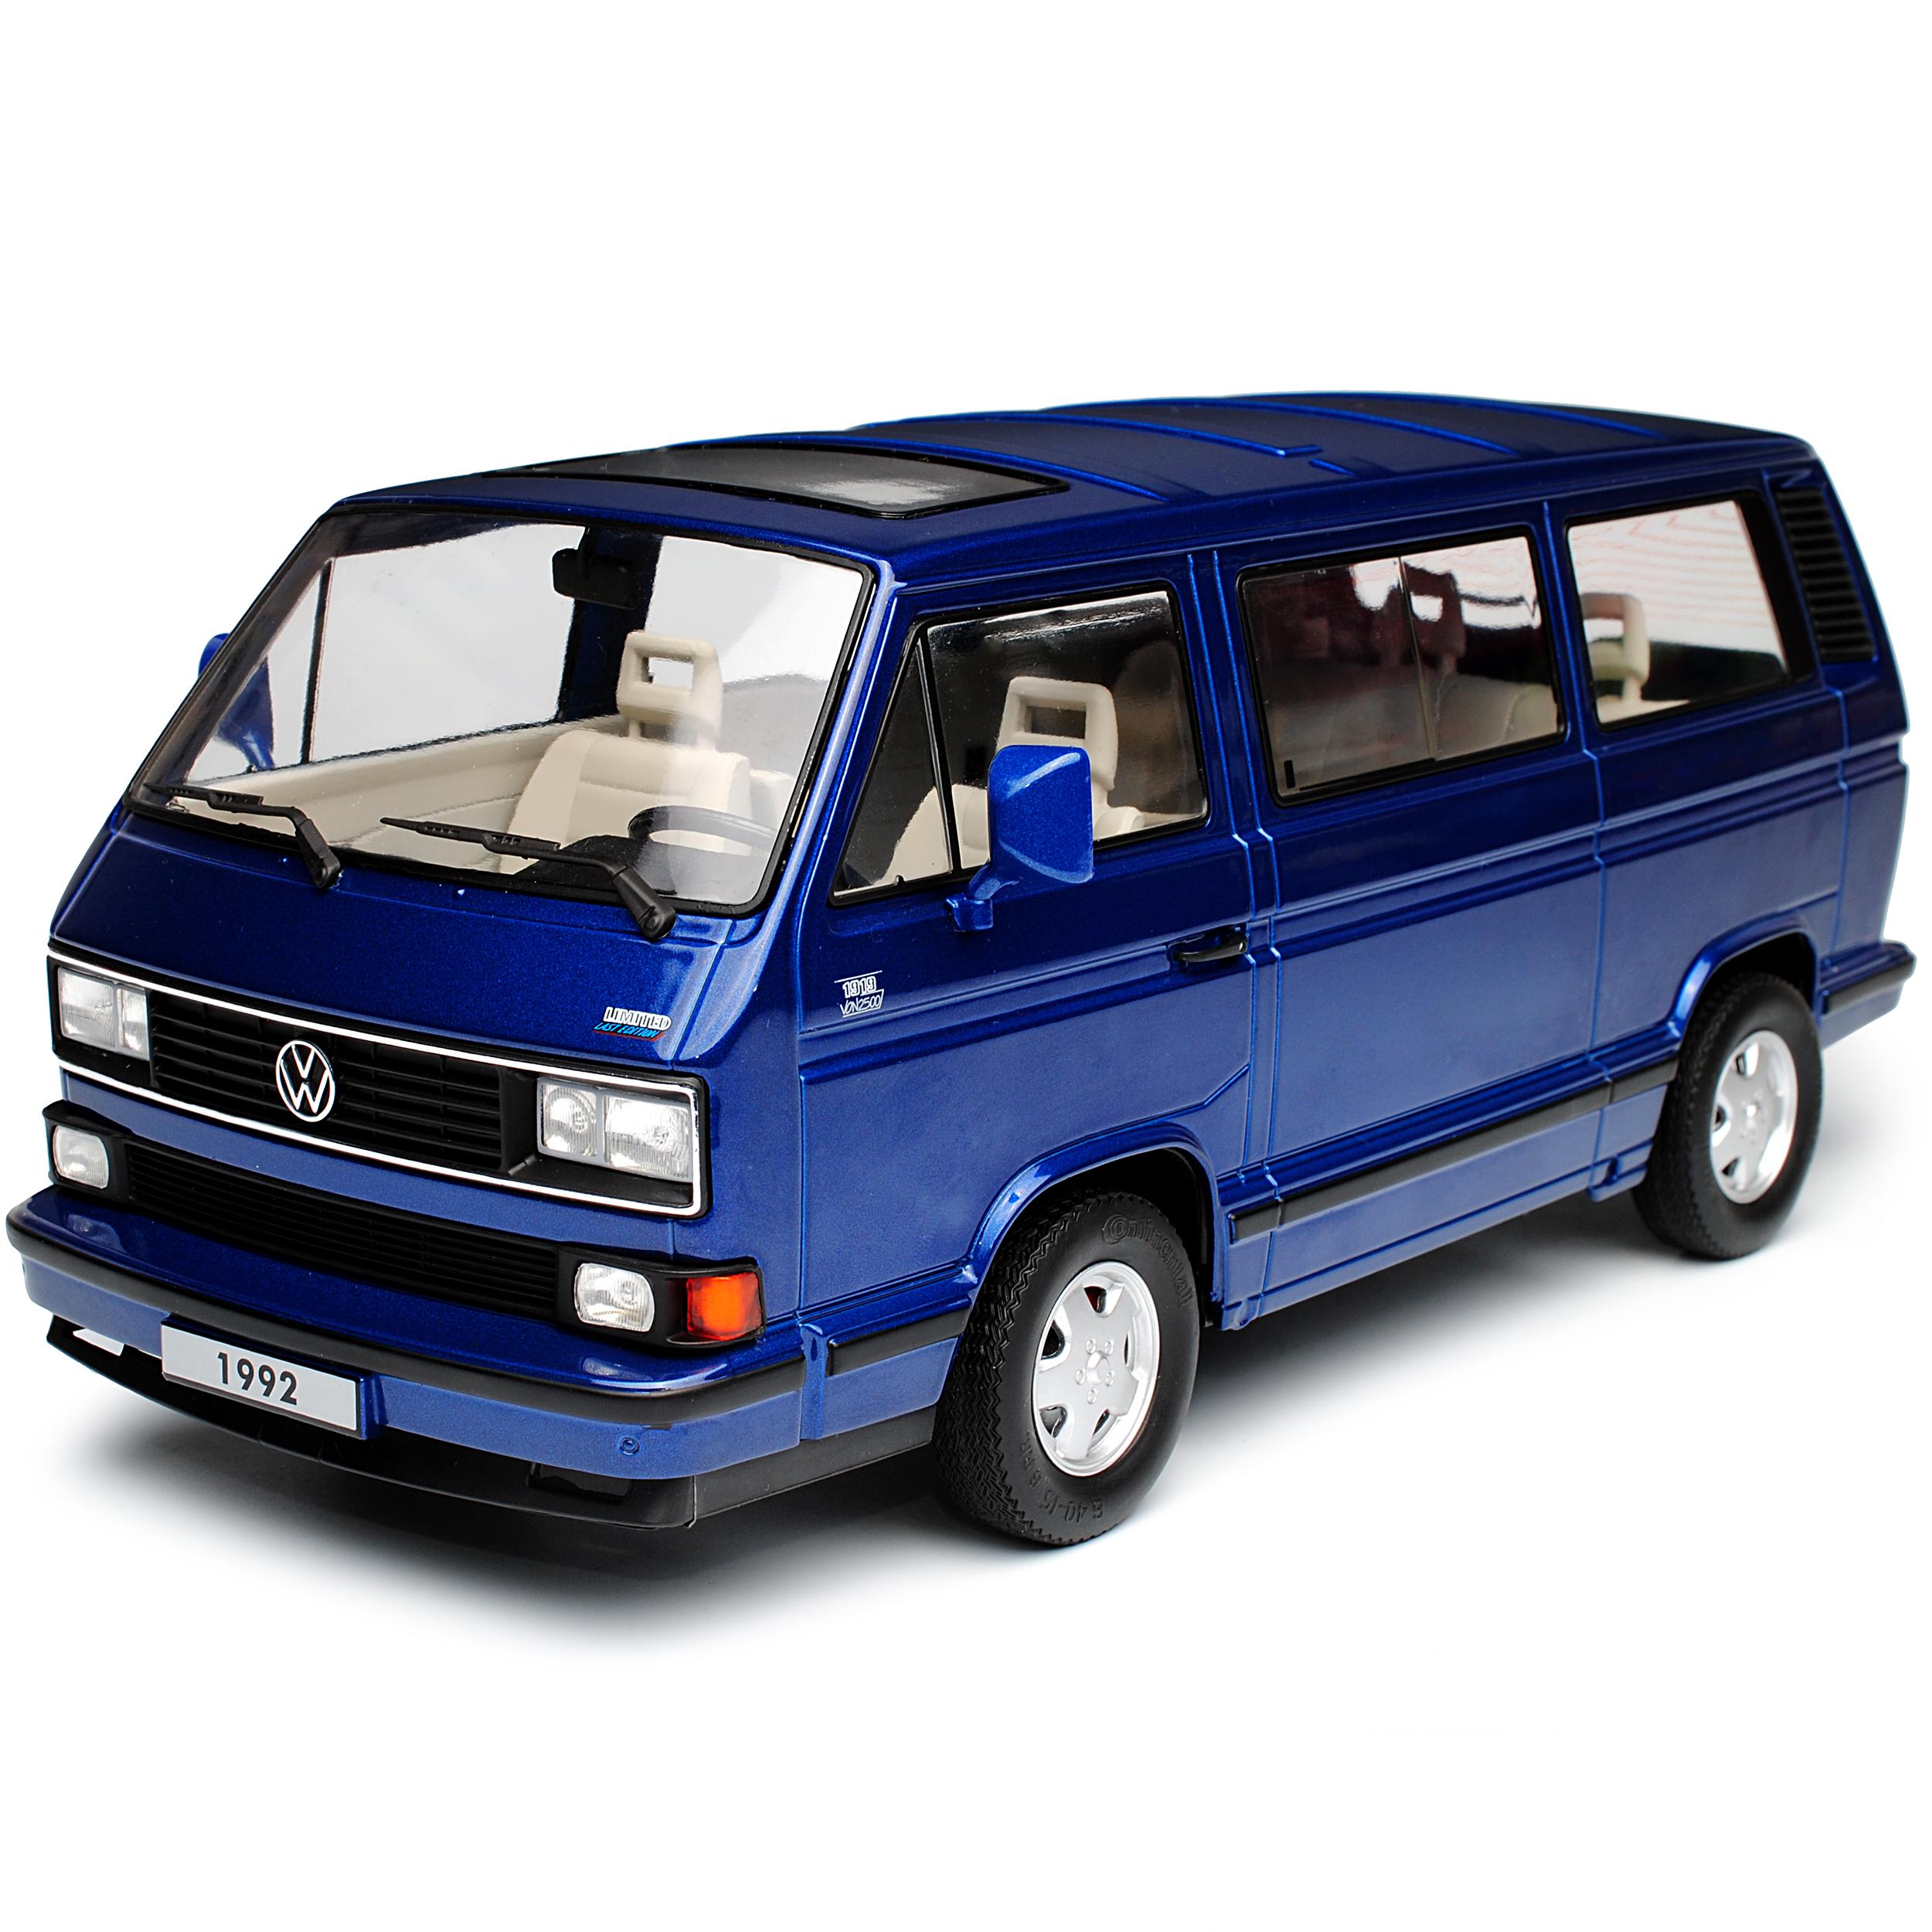 VW Volkswagen T3 Bus Multivan blue Transporter 1979-1992 1979-1992 1979-1992 limitiert 1 von 1750 .. aea46c